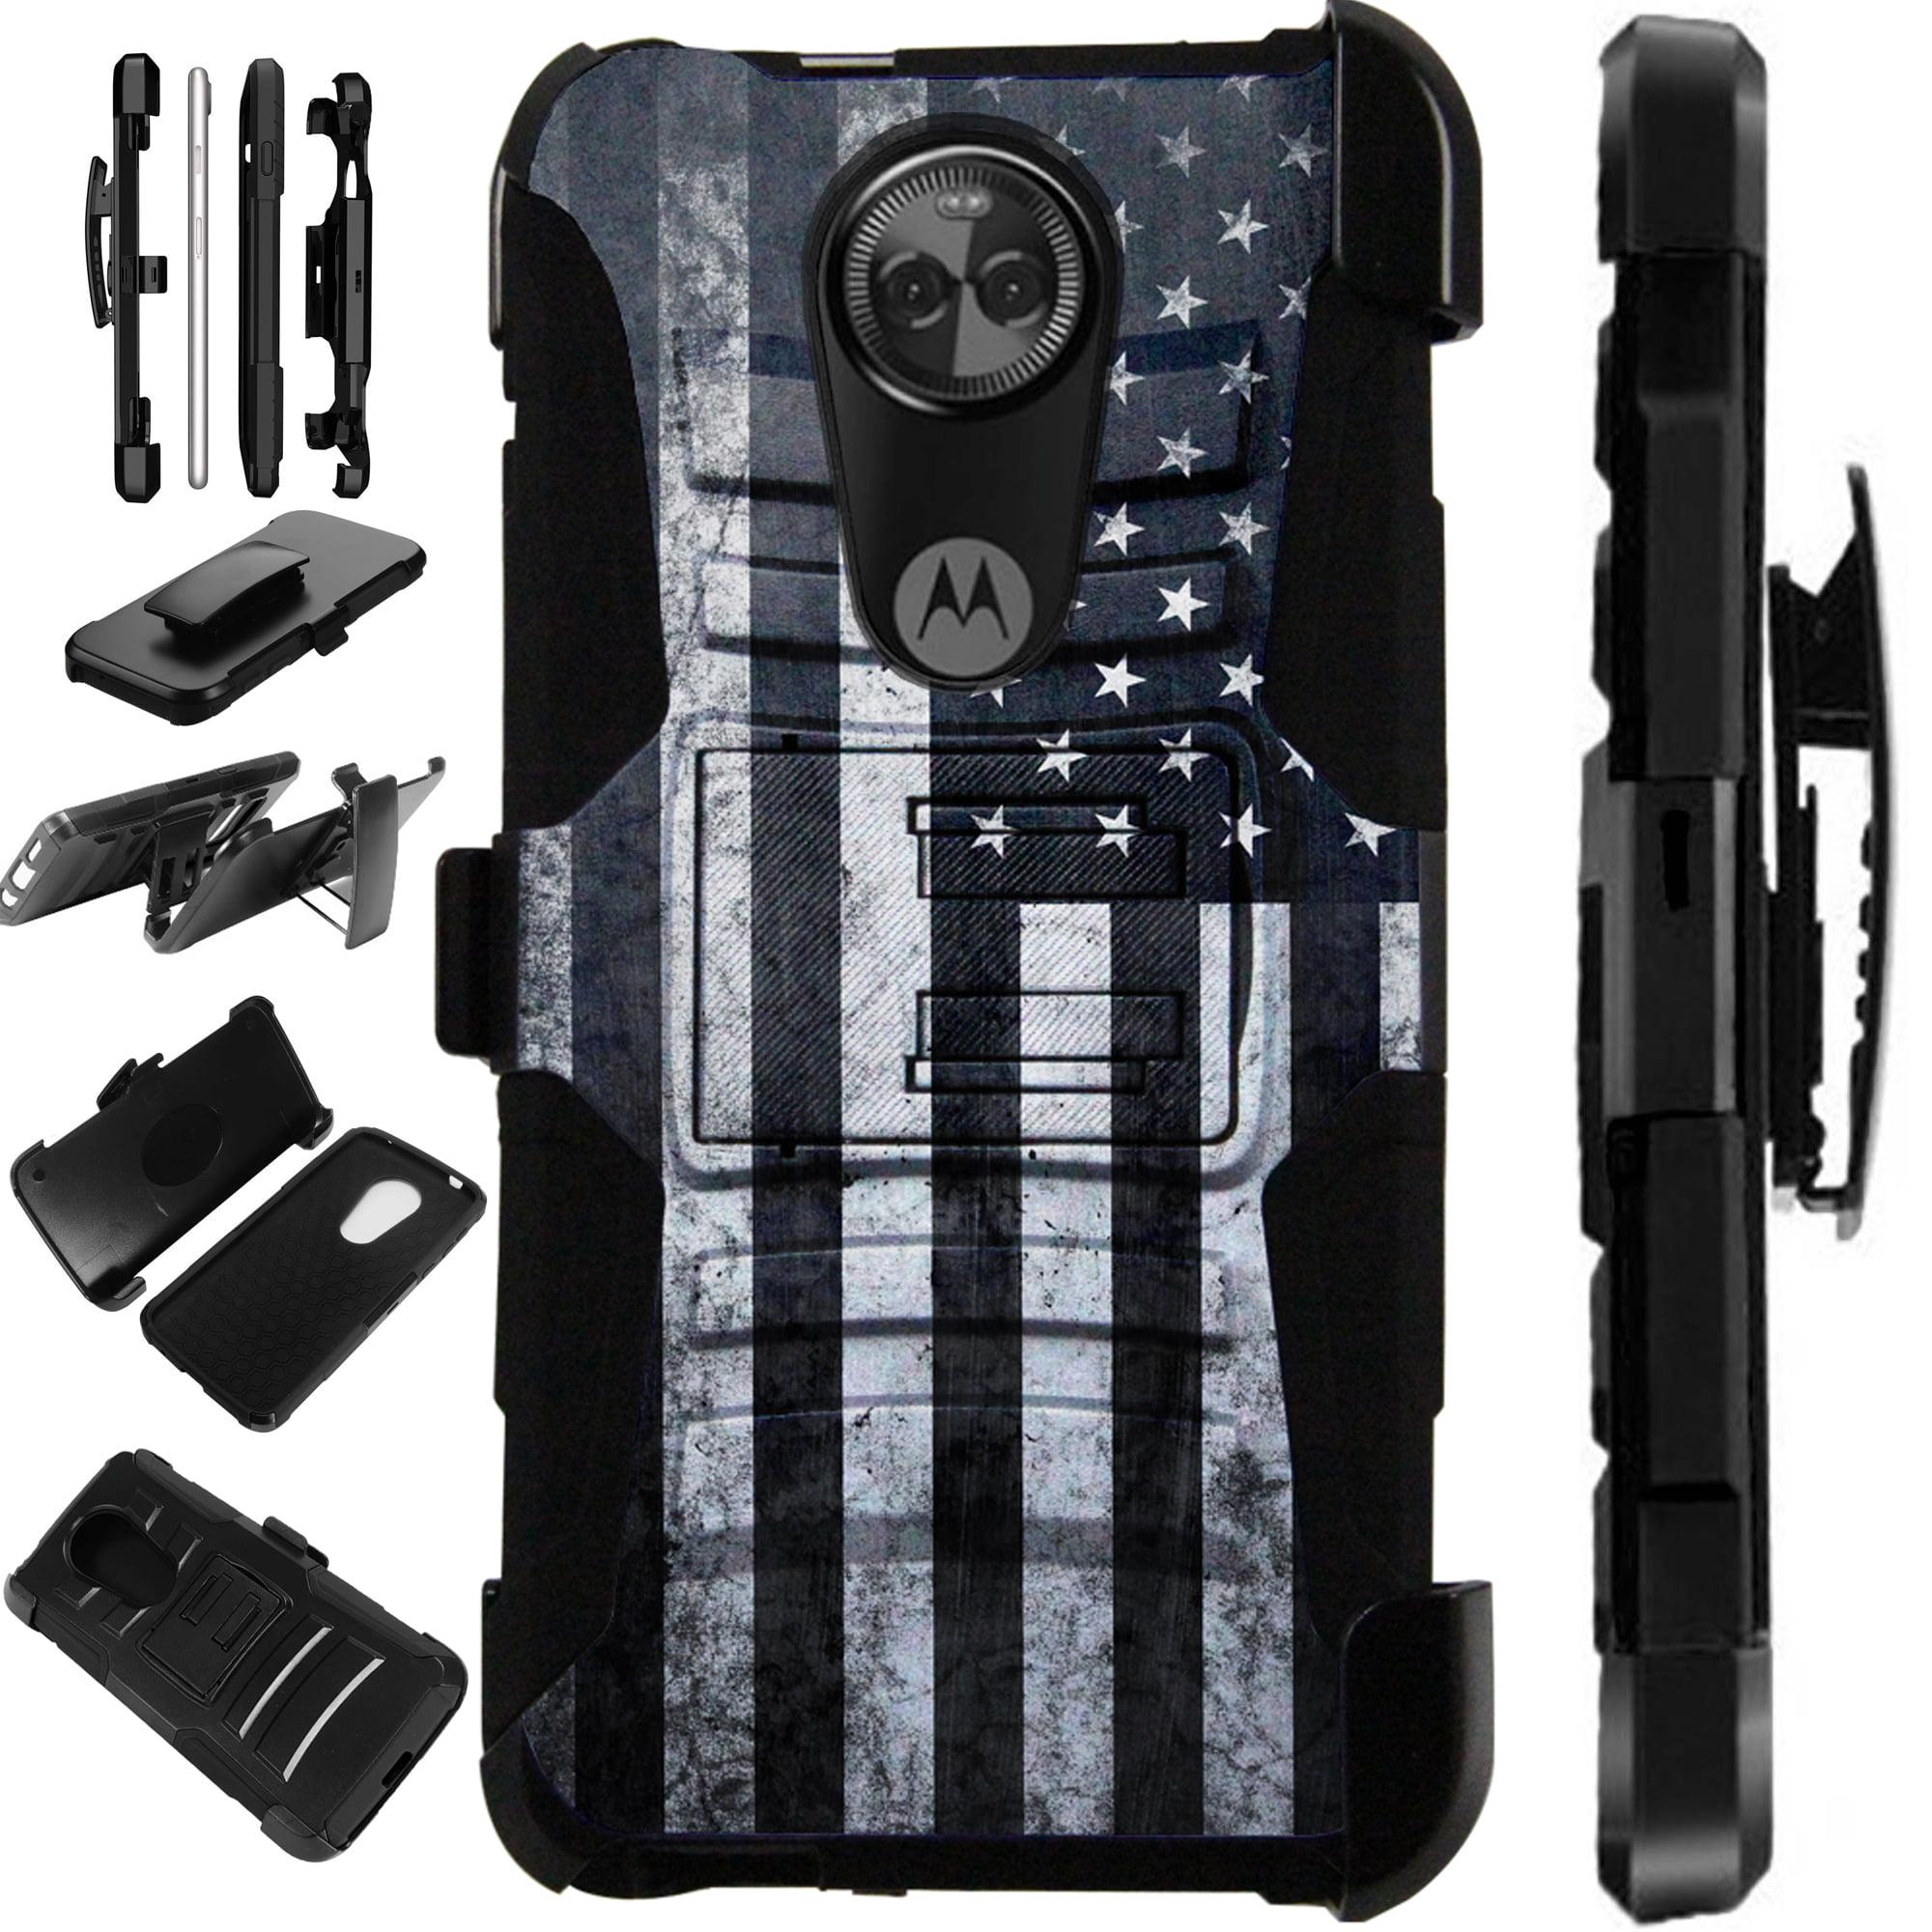 For Motorola Moto E5 Plus | Moto E5 Supra Case Armor Hybrid Silicone Cover Stand LuxGuard Holster (Gray US Flag)